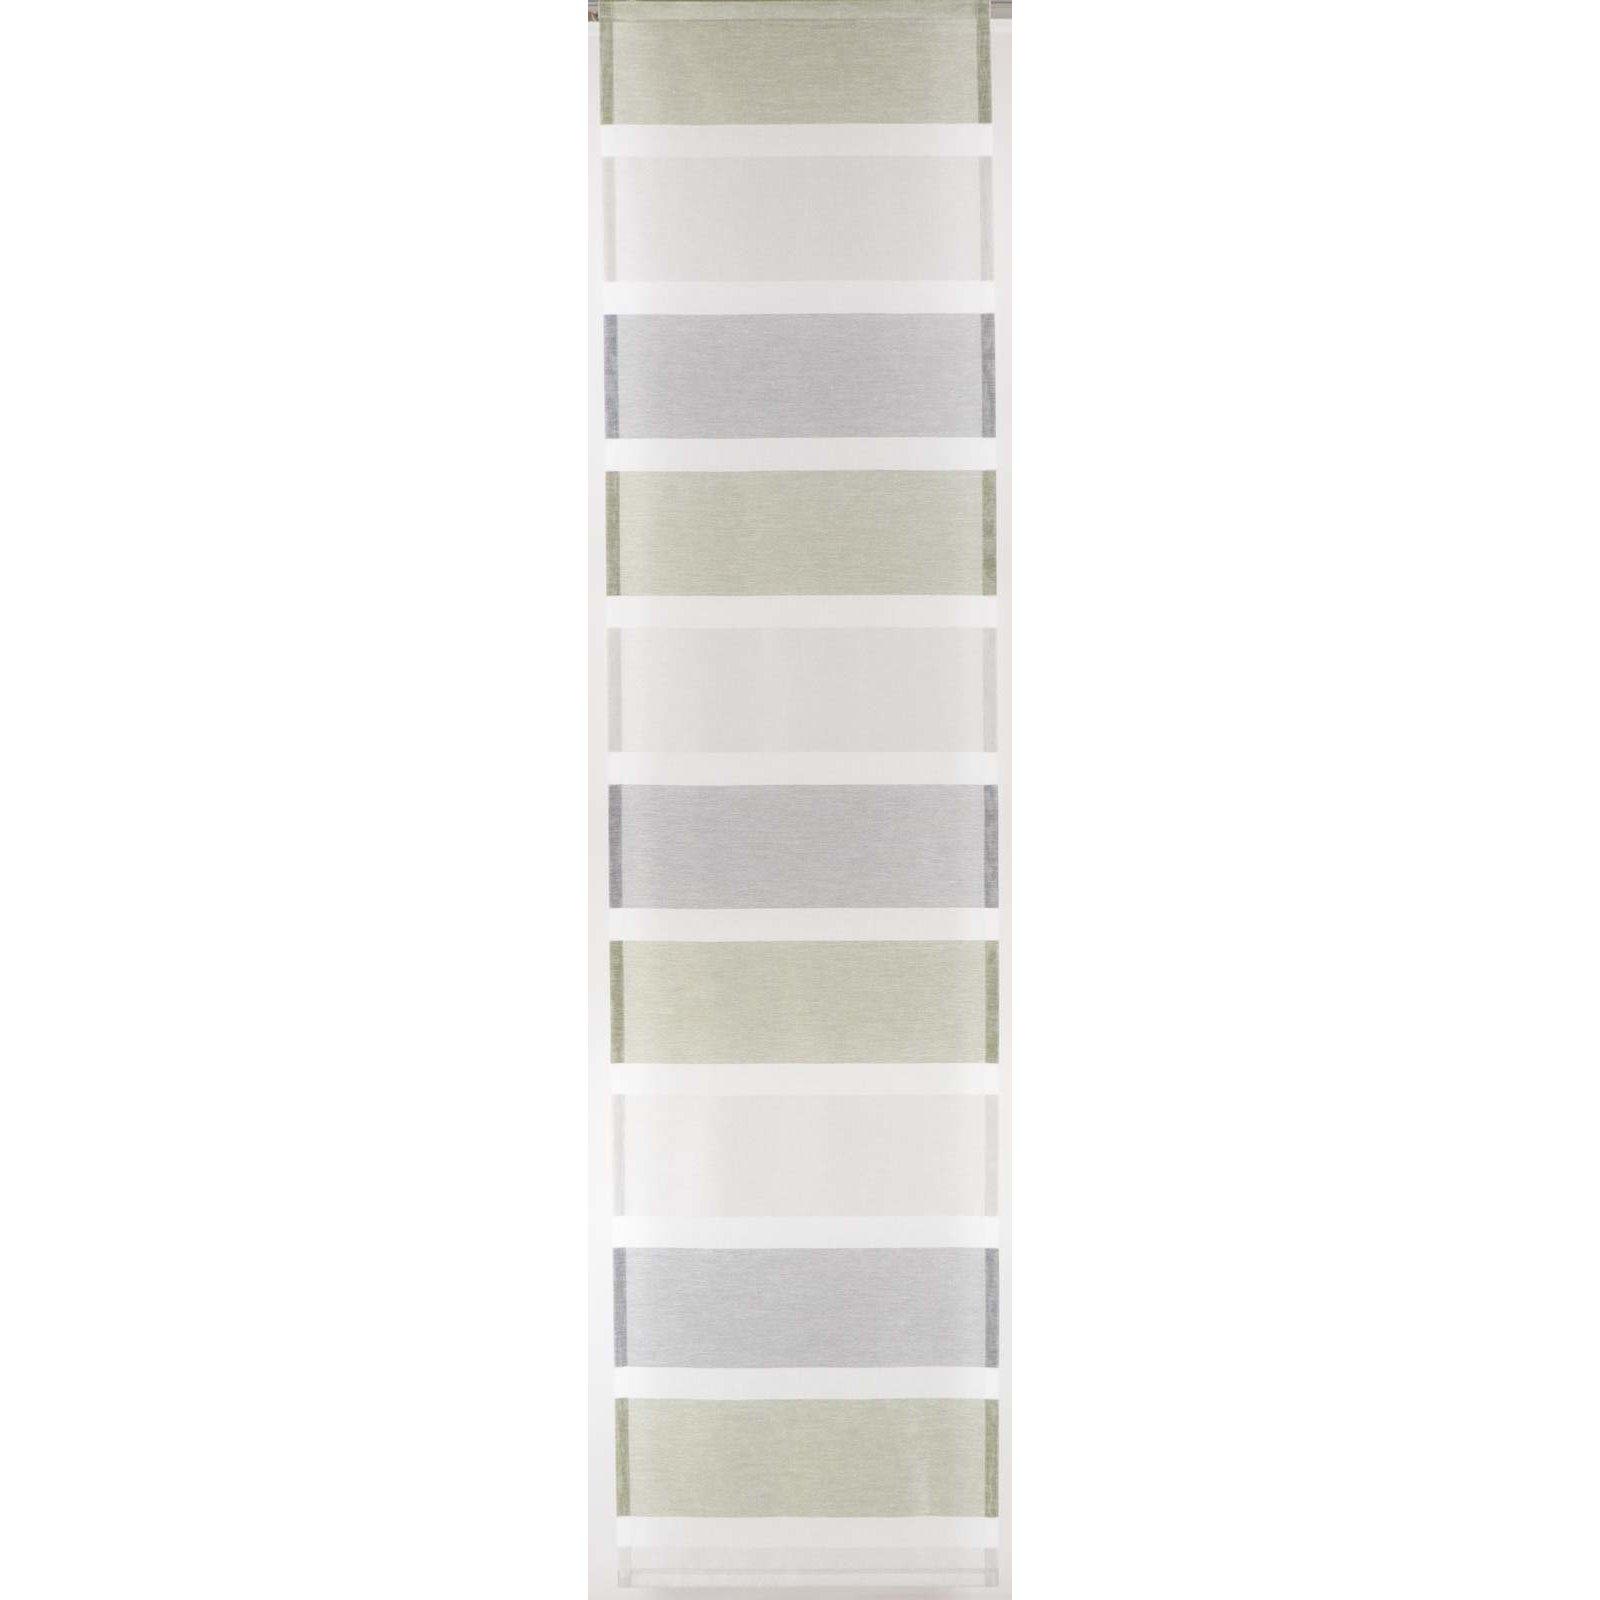 Schiebevorhang Grün Grau Quer Gestreift 60x245cm